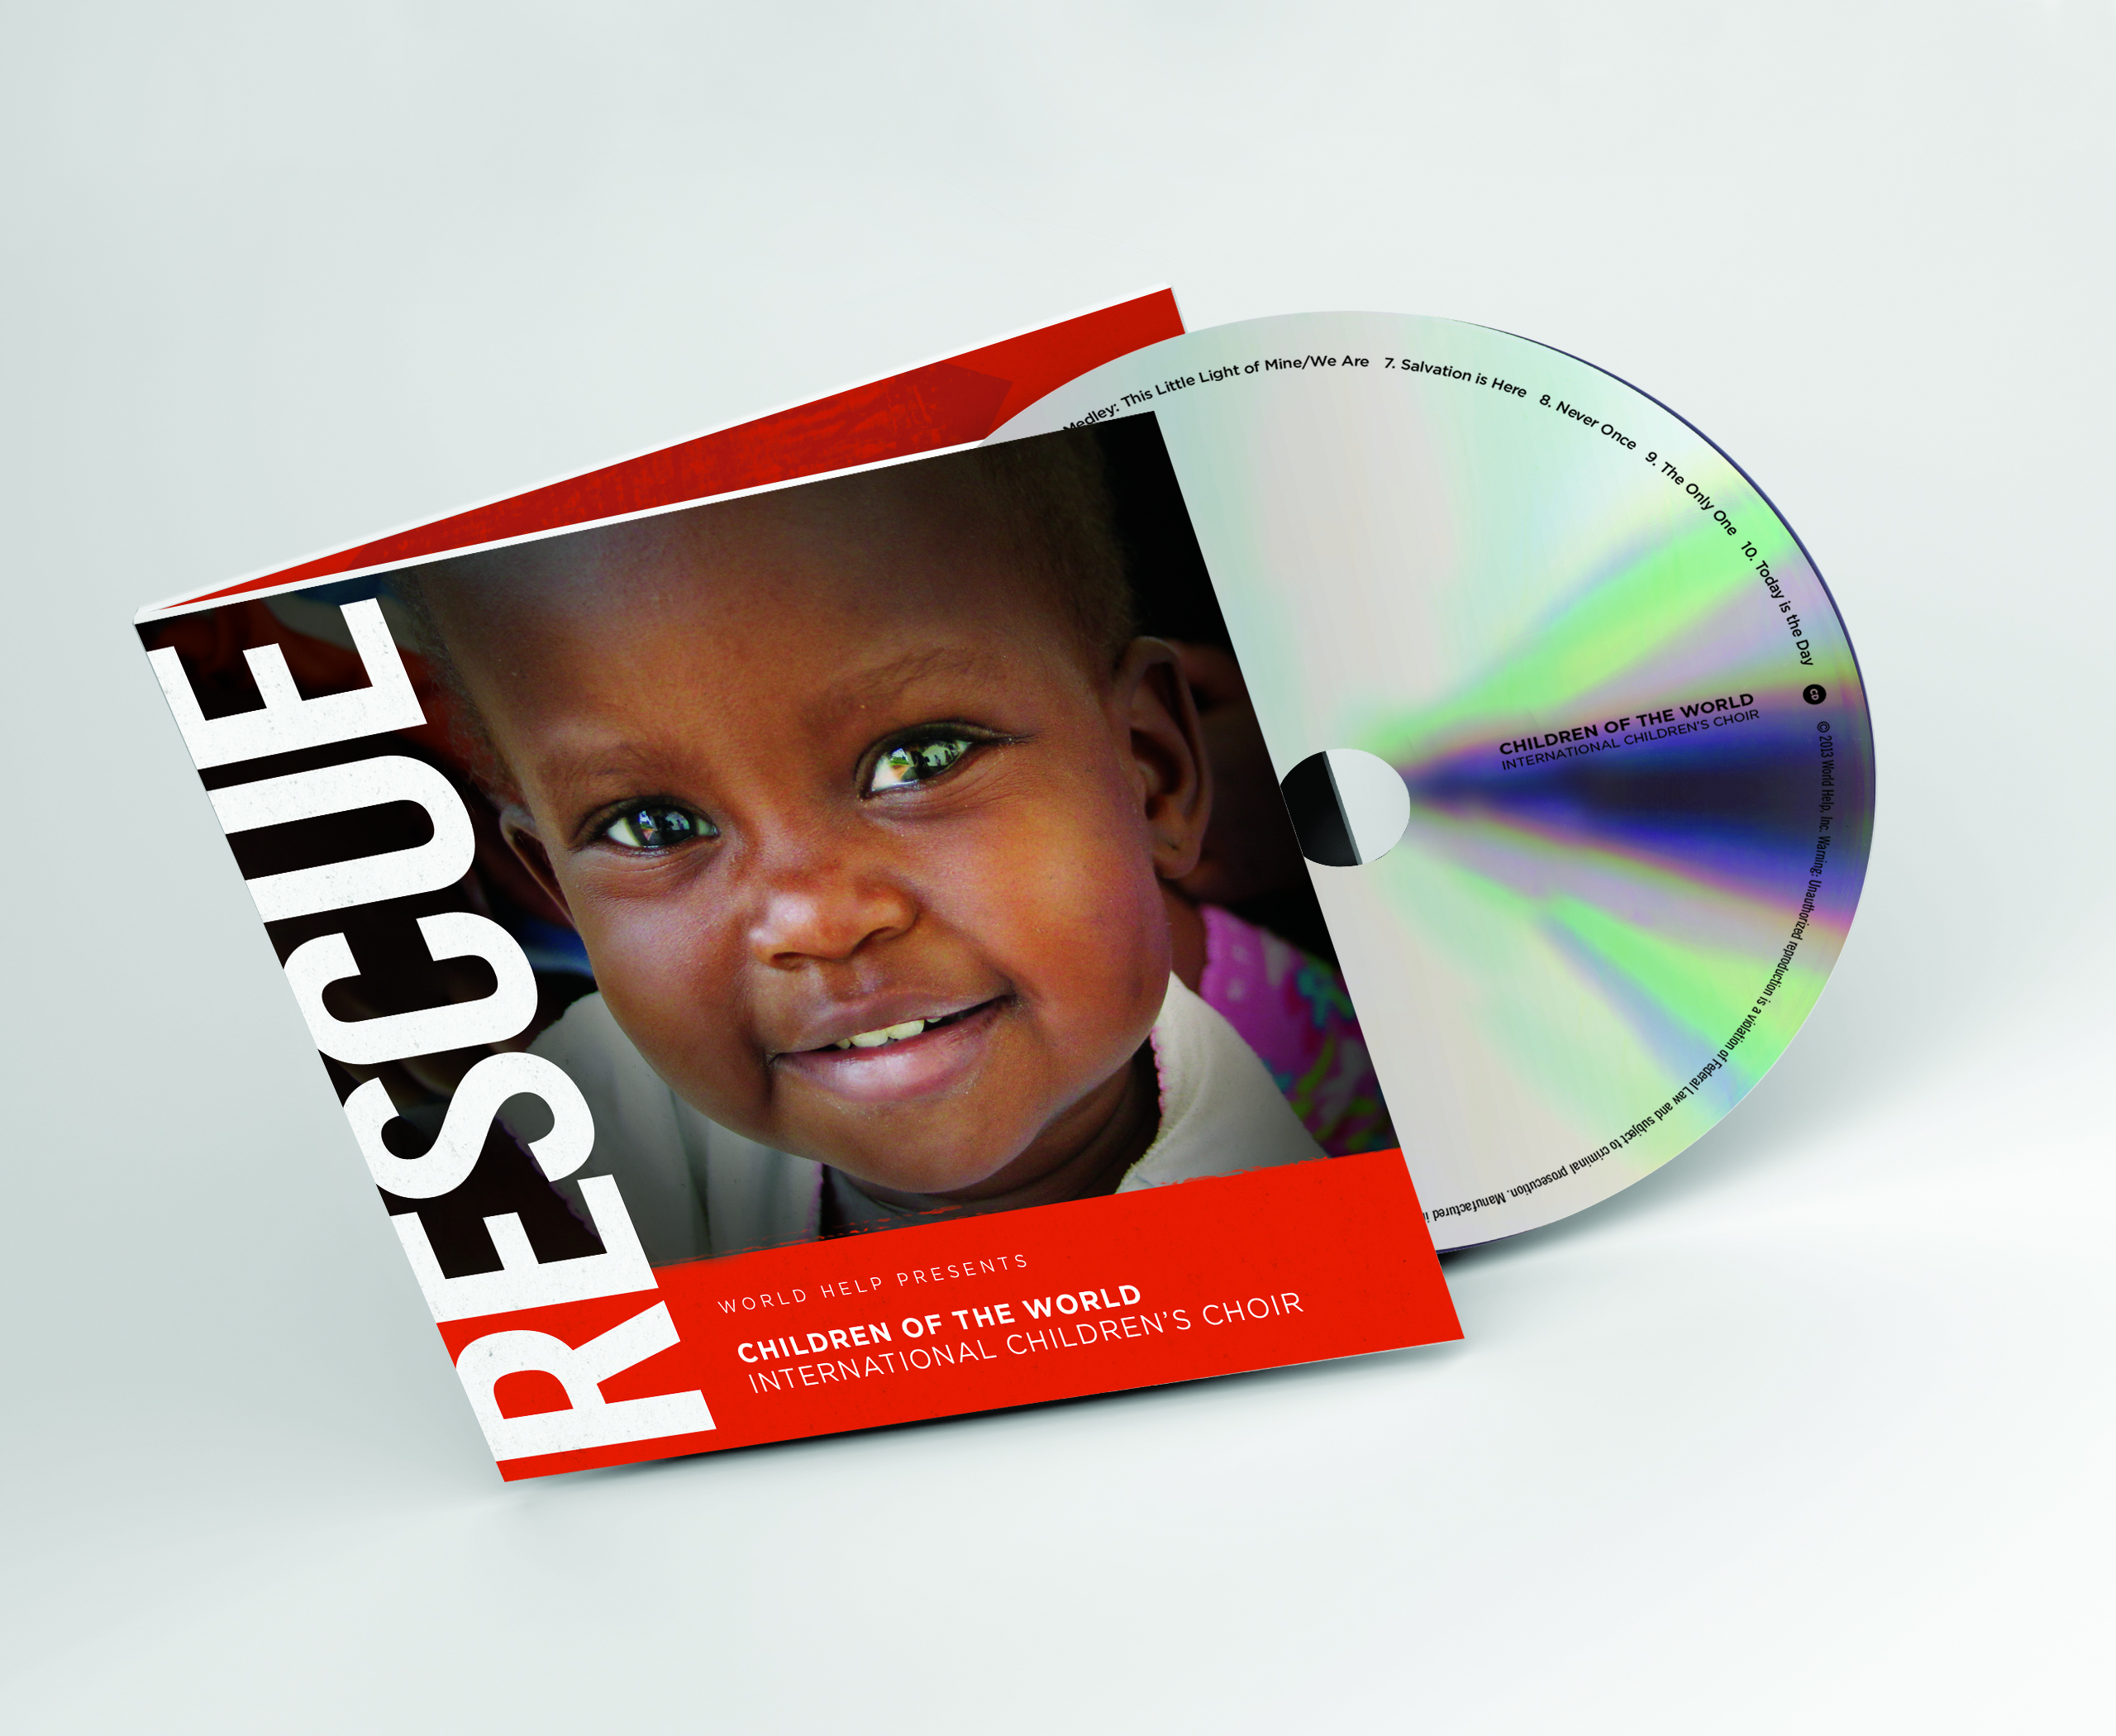 Rescue Tour Album - Children of the World